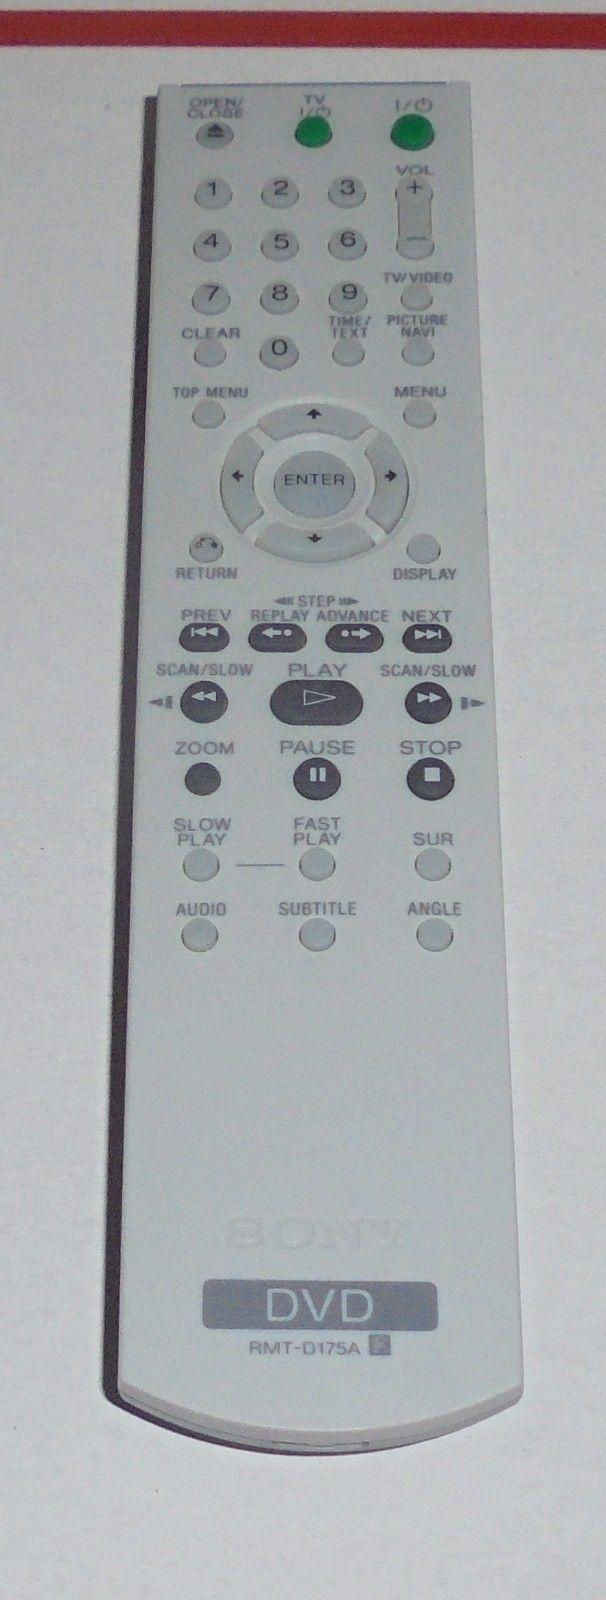 SONY RMT-D175A DVD Player Remote DVPNS41 DVP-NS41P NS45P DVPNS45PS NS50P TESTED